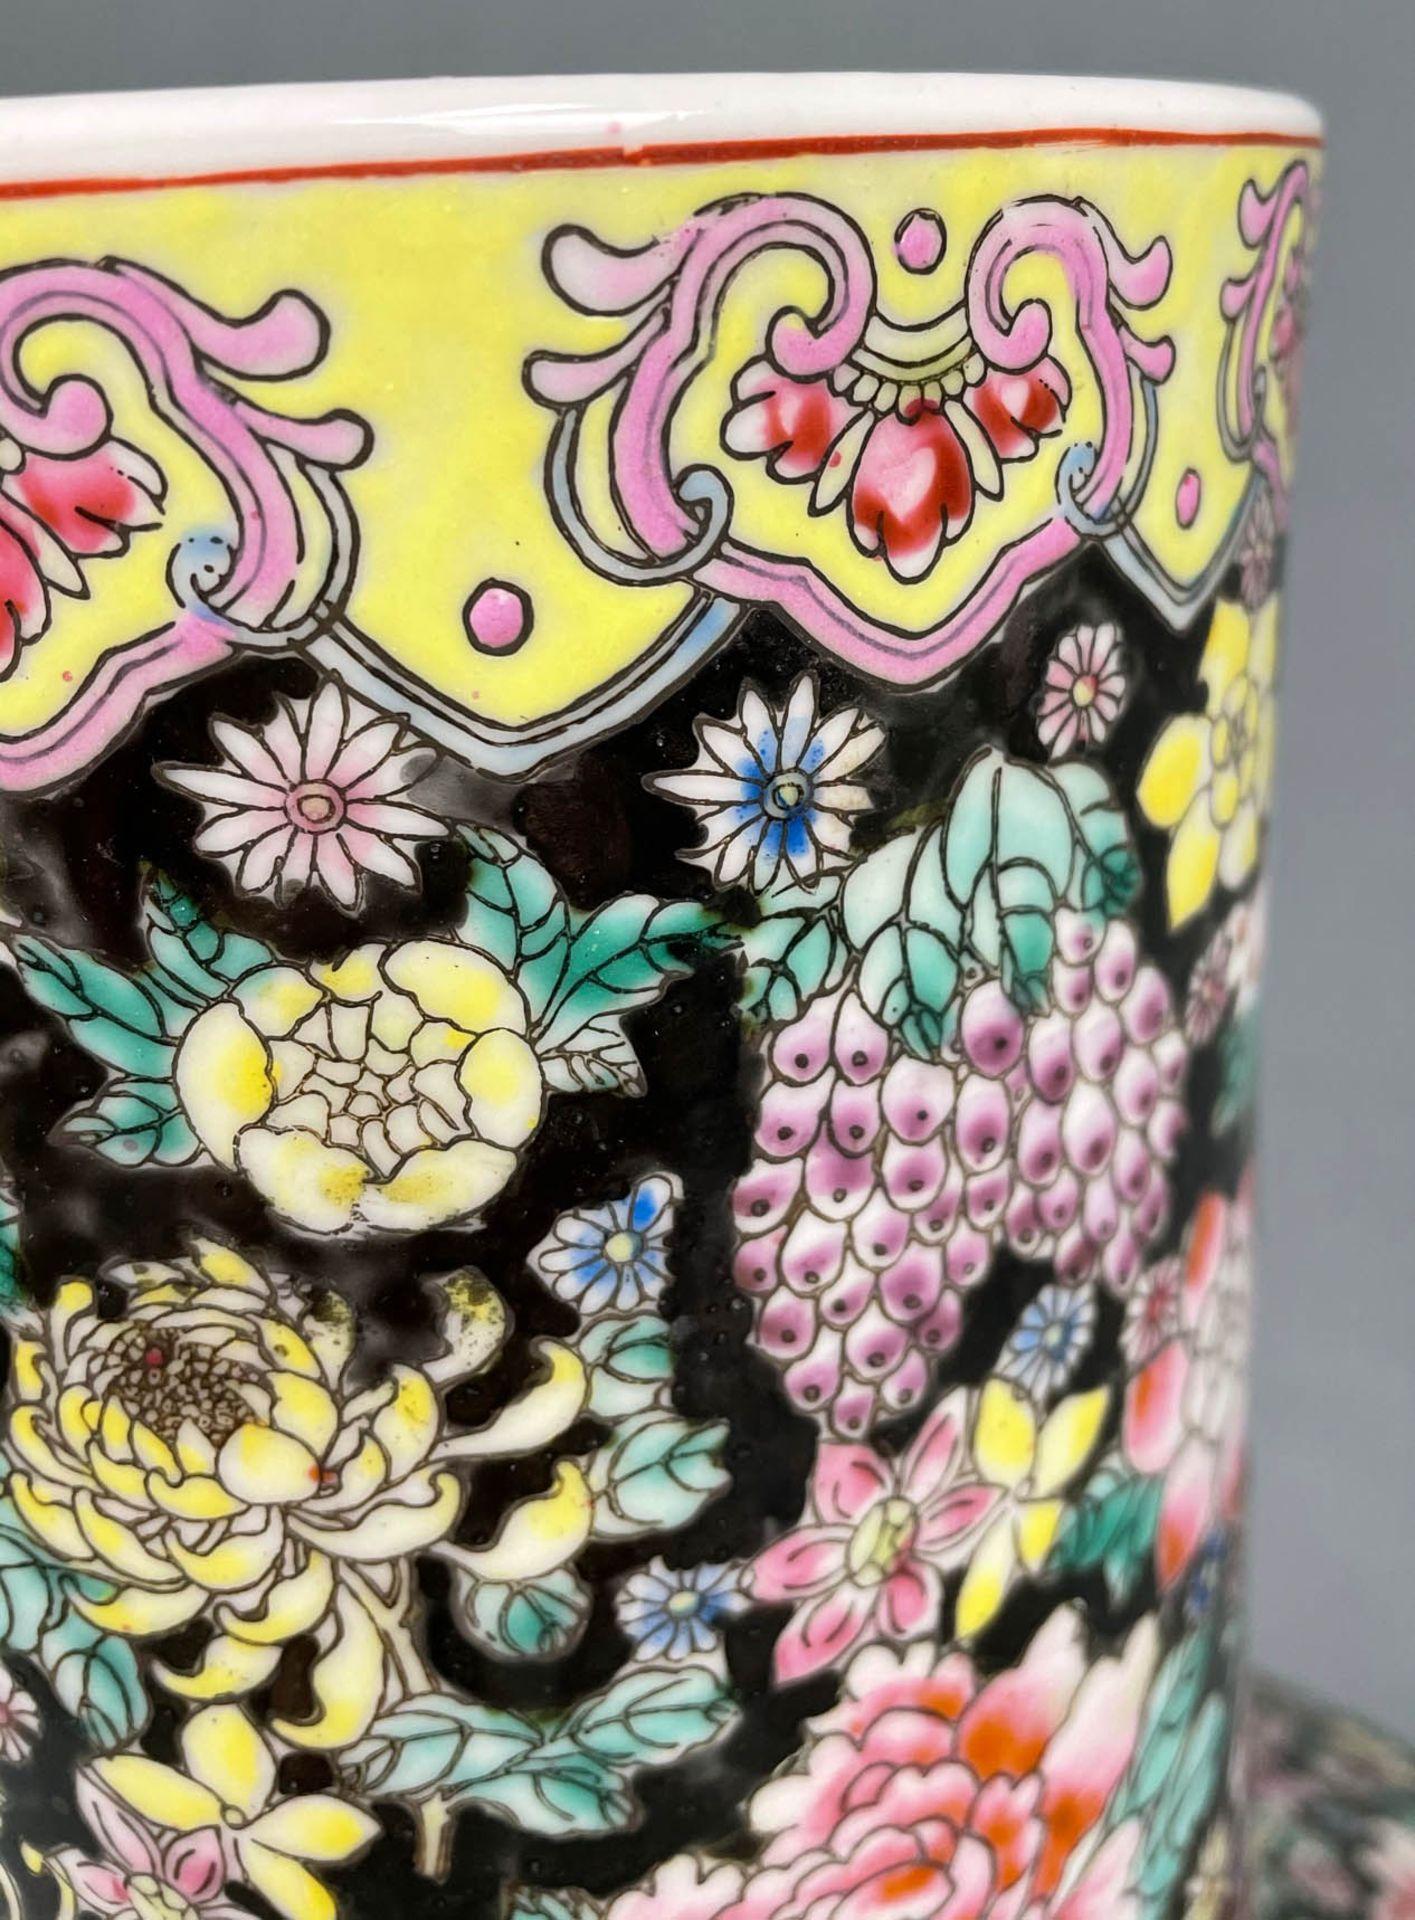 China. Porzellan. Vase. Stempelmarke circa 1930 - 1950. 53 cm hoch. - Image 15 of 20